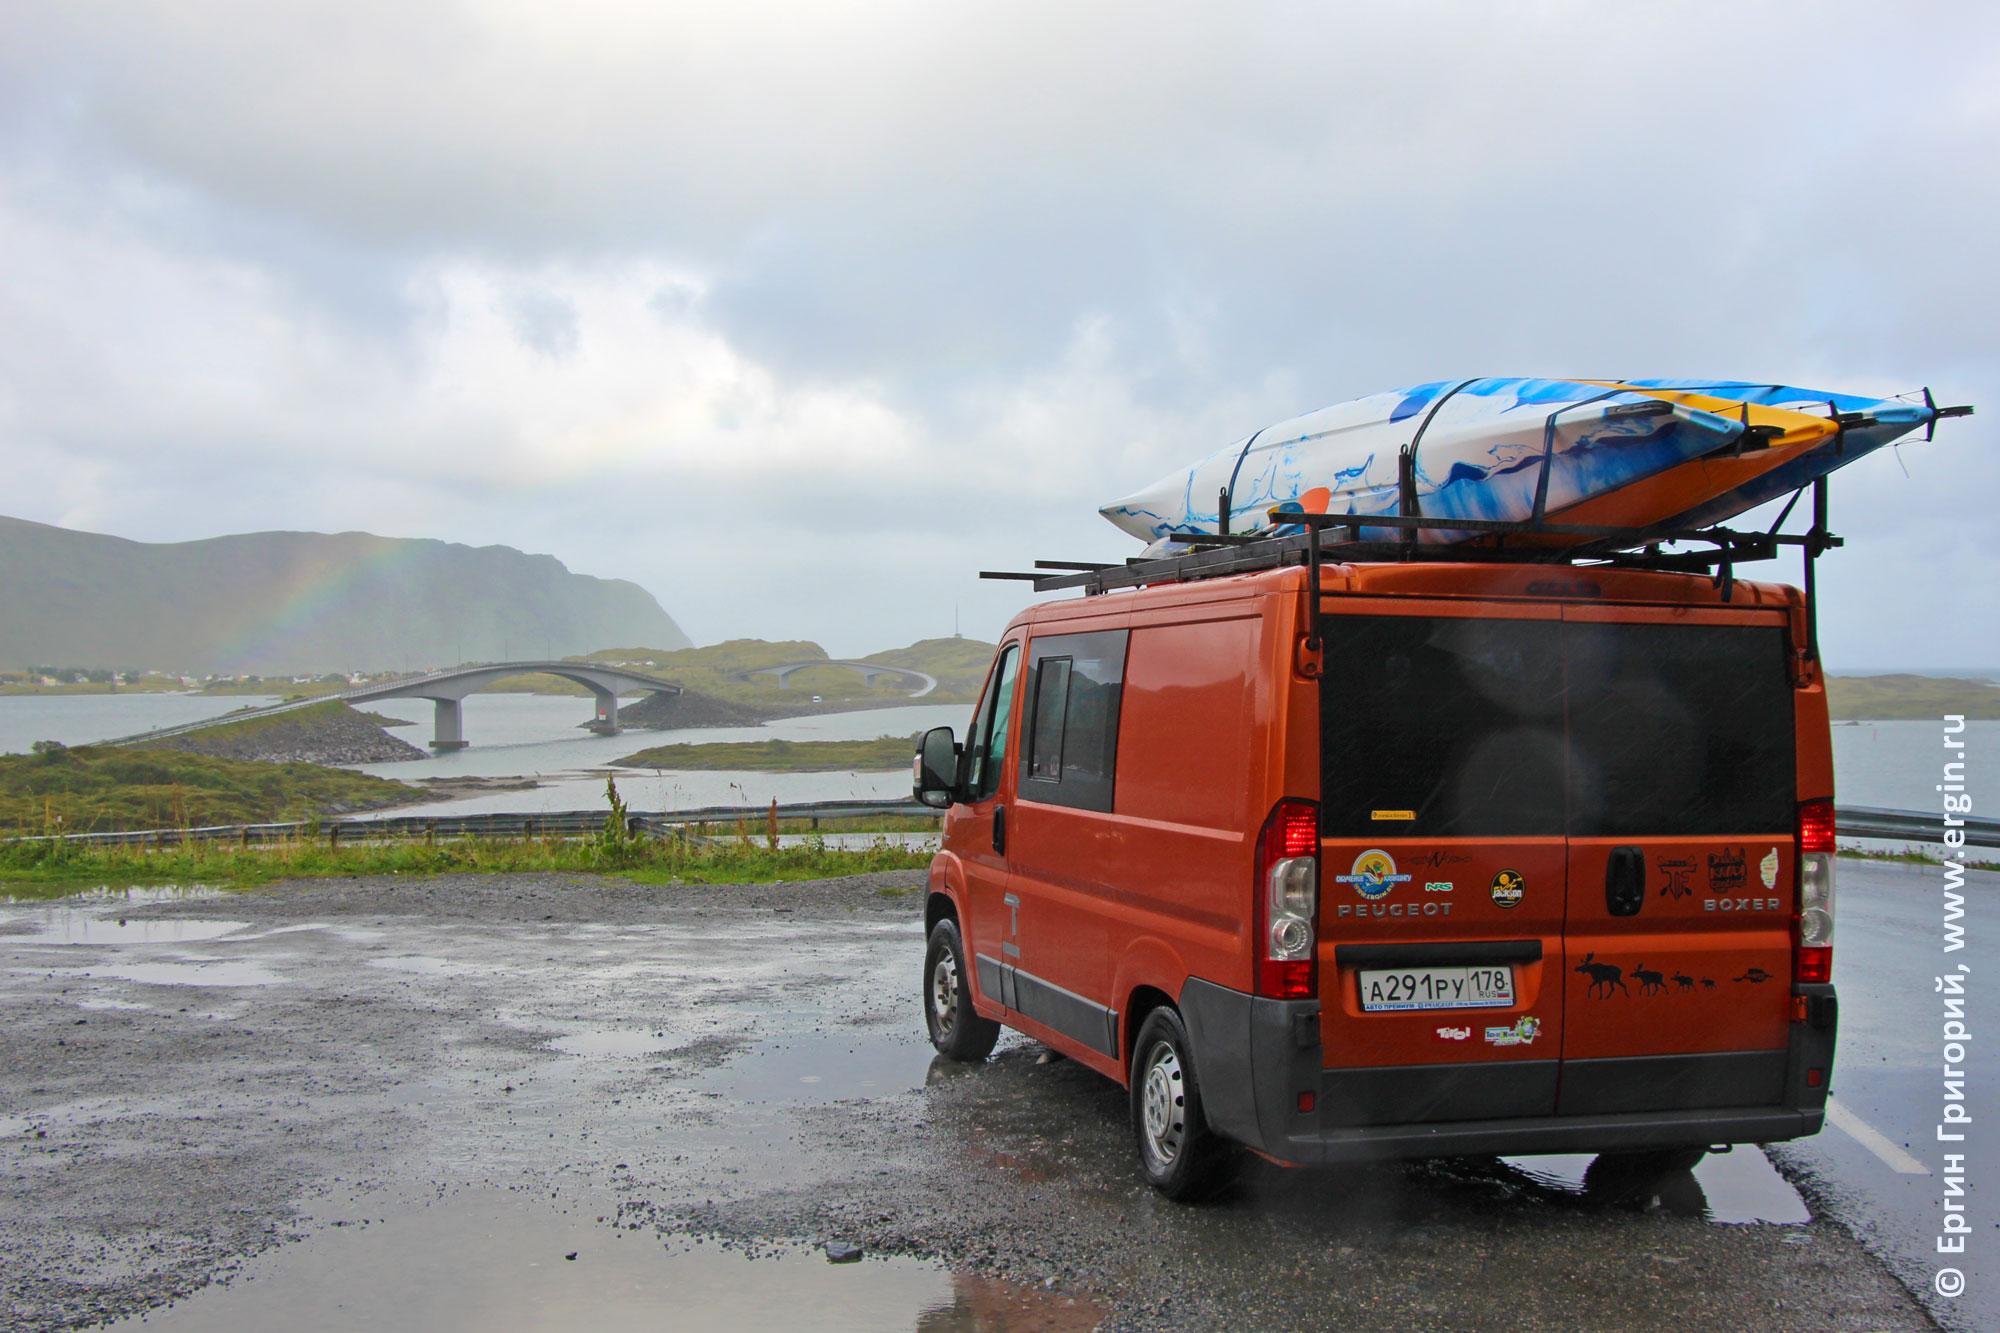 Микроавтобус с морскими каяками на крыше